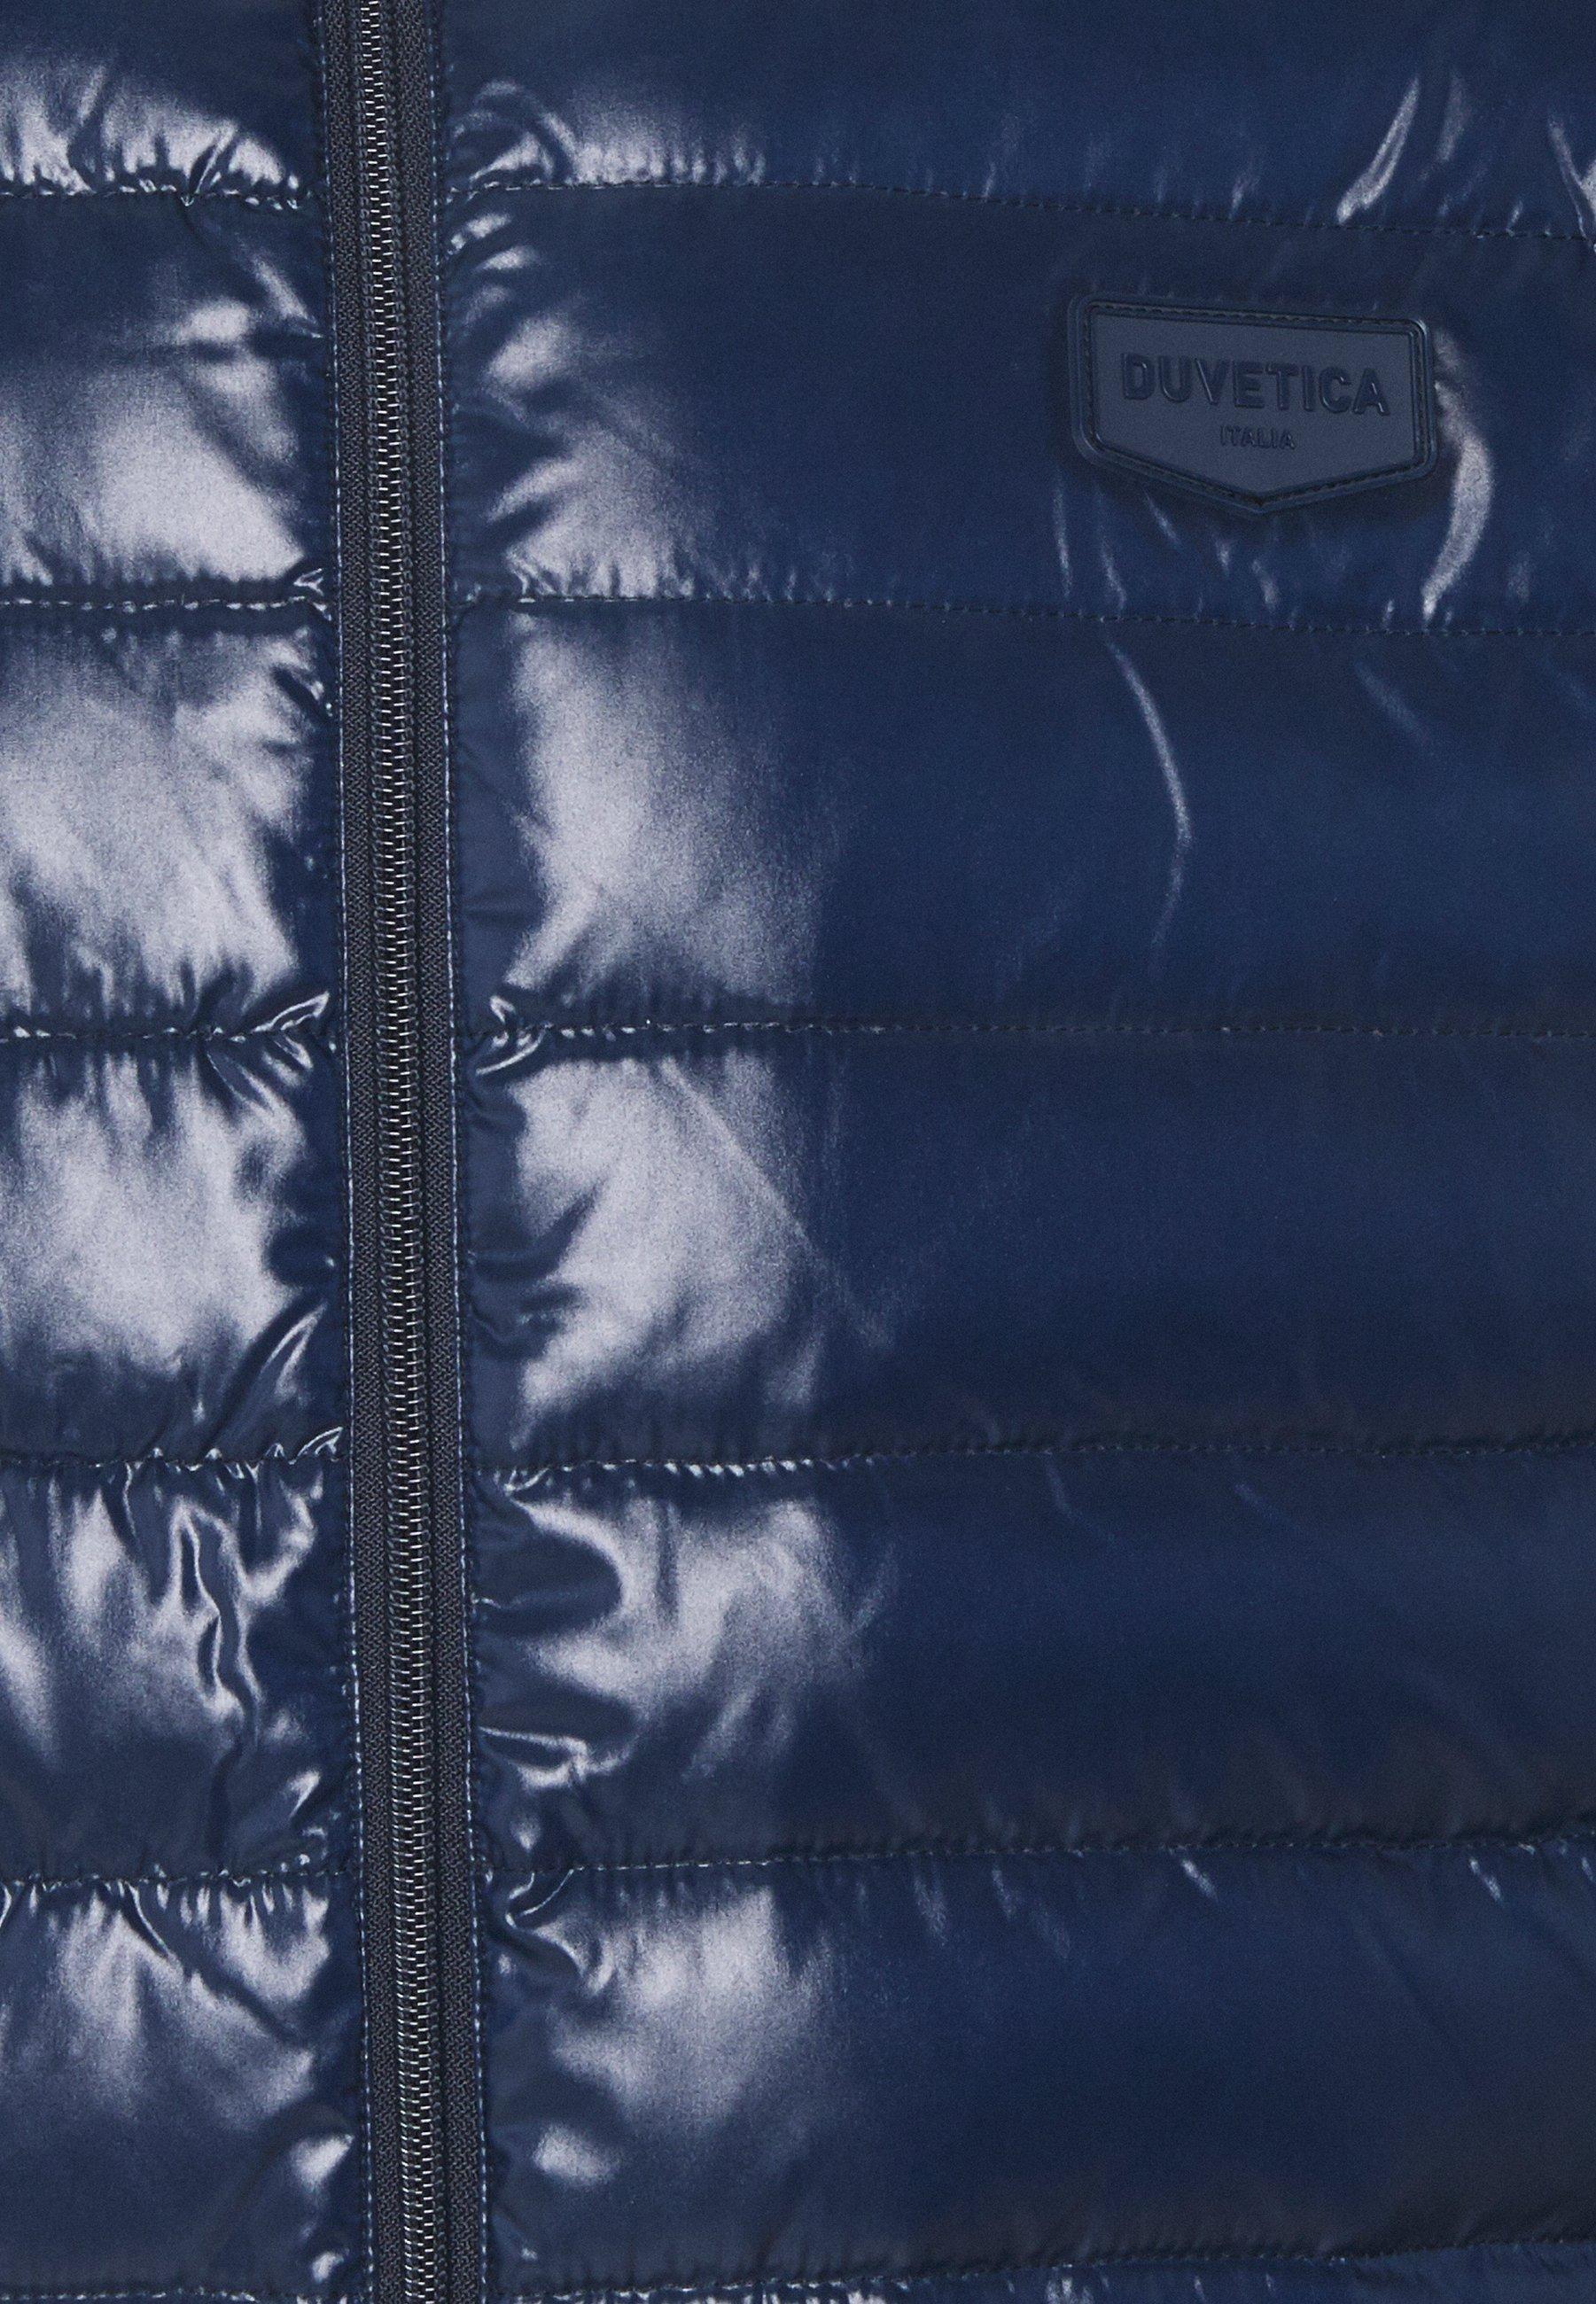 2020 Vêtements homme Duvetica MARFAKDUE Doudoune blu scuro wMxbfI0A